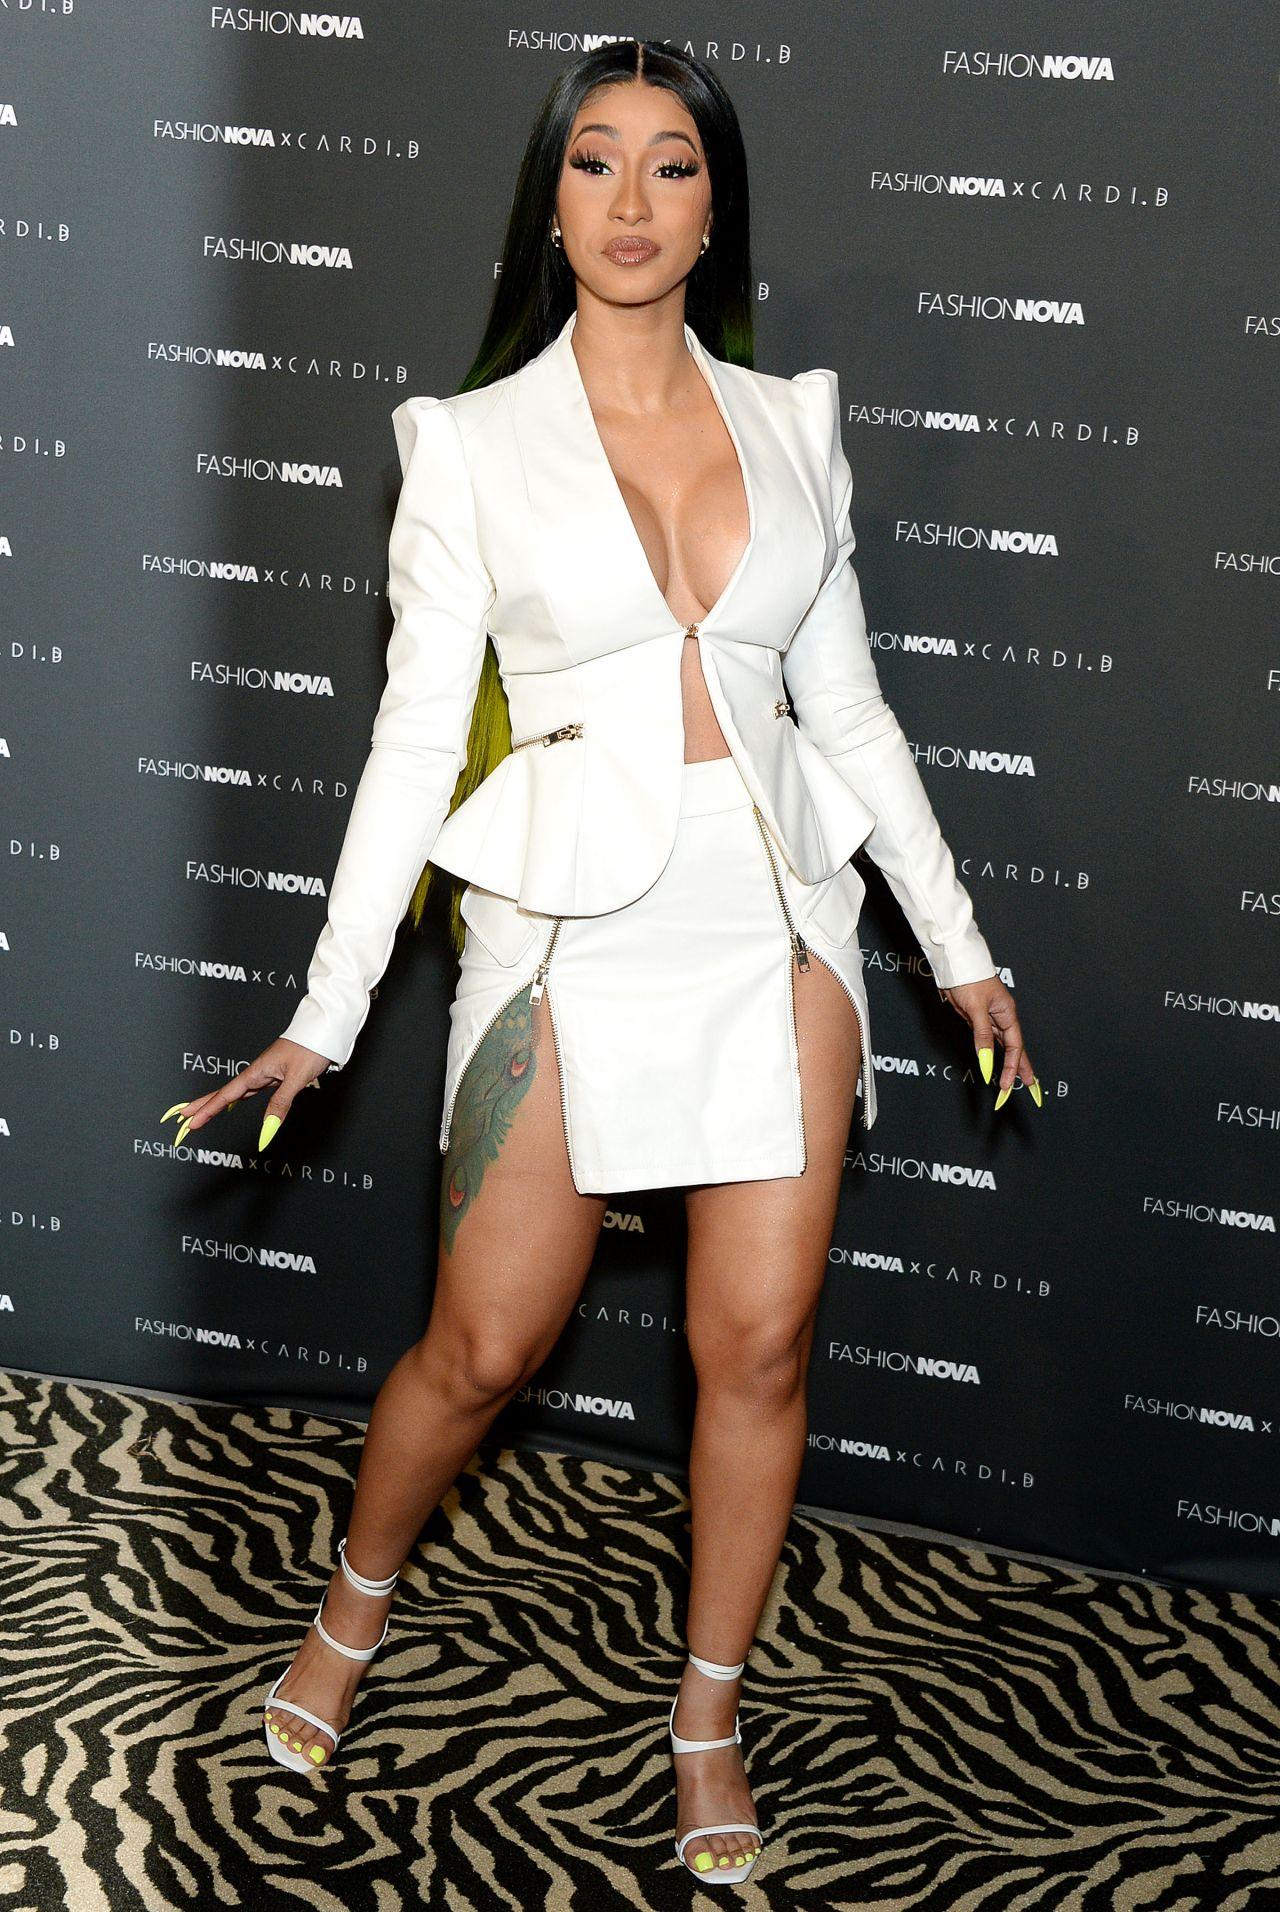 Cardi B Outfits: Fashion Nova X Cardi B Collection Launch Event